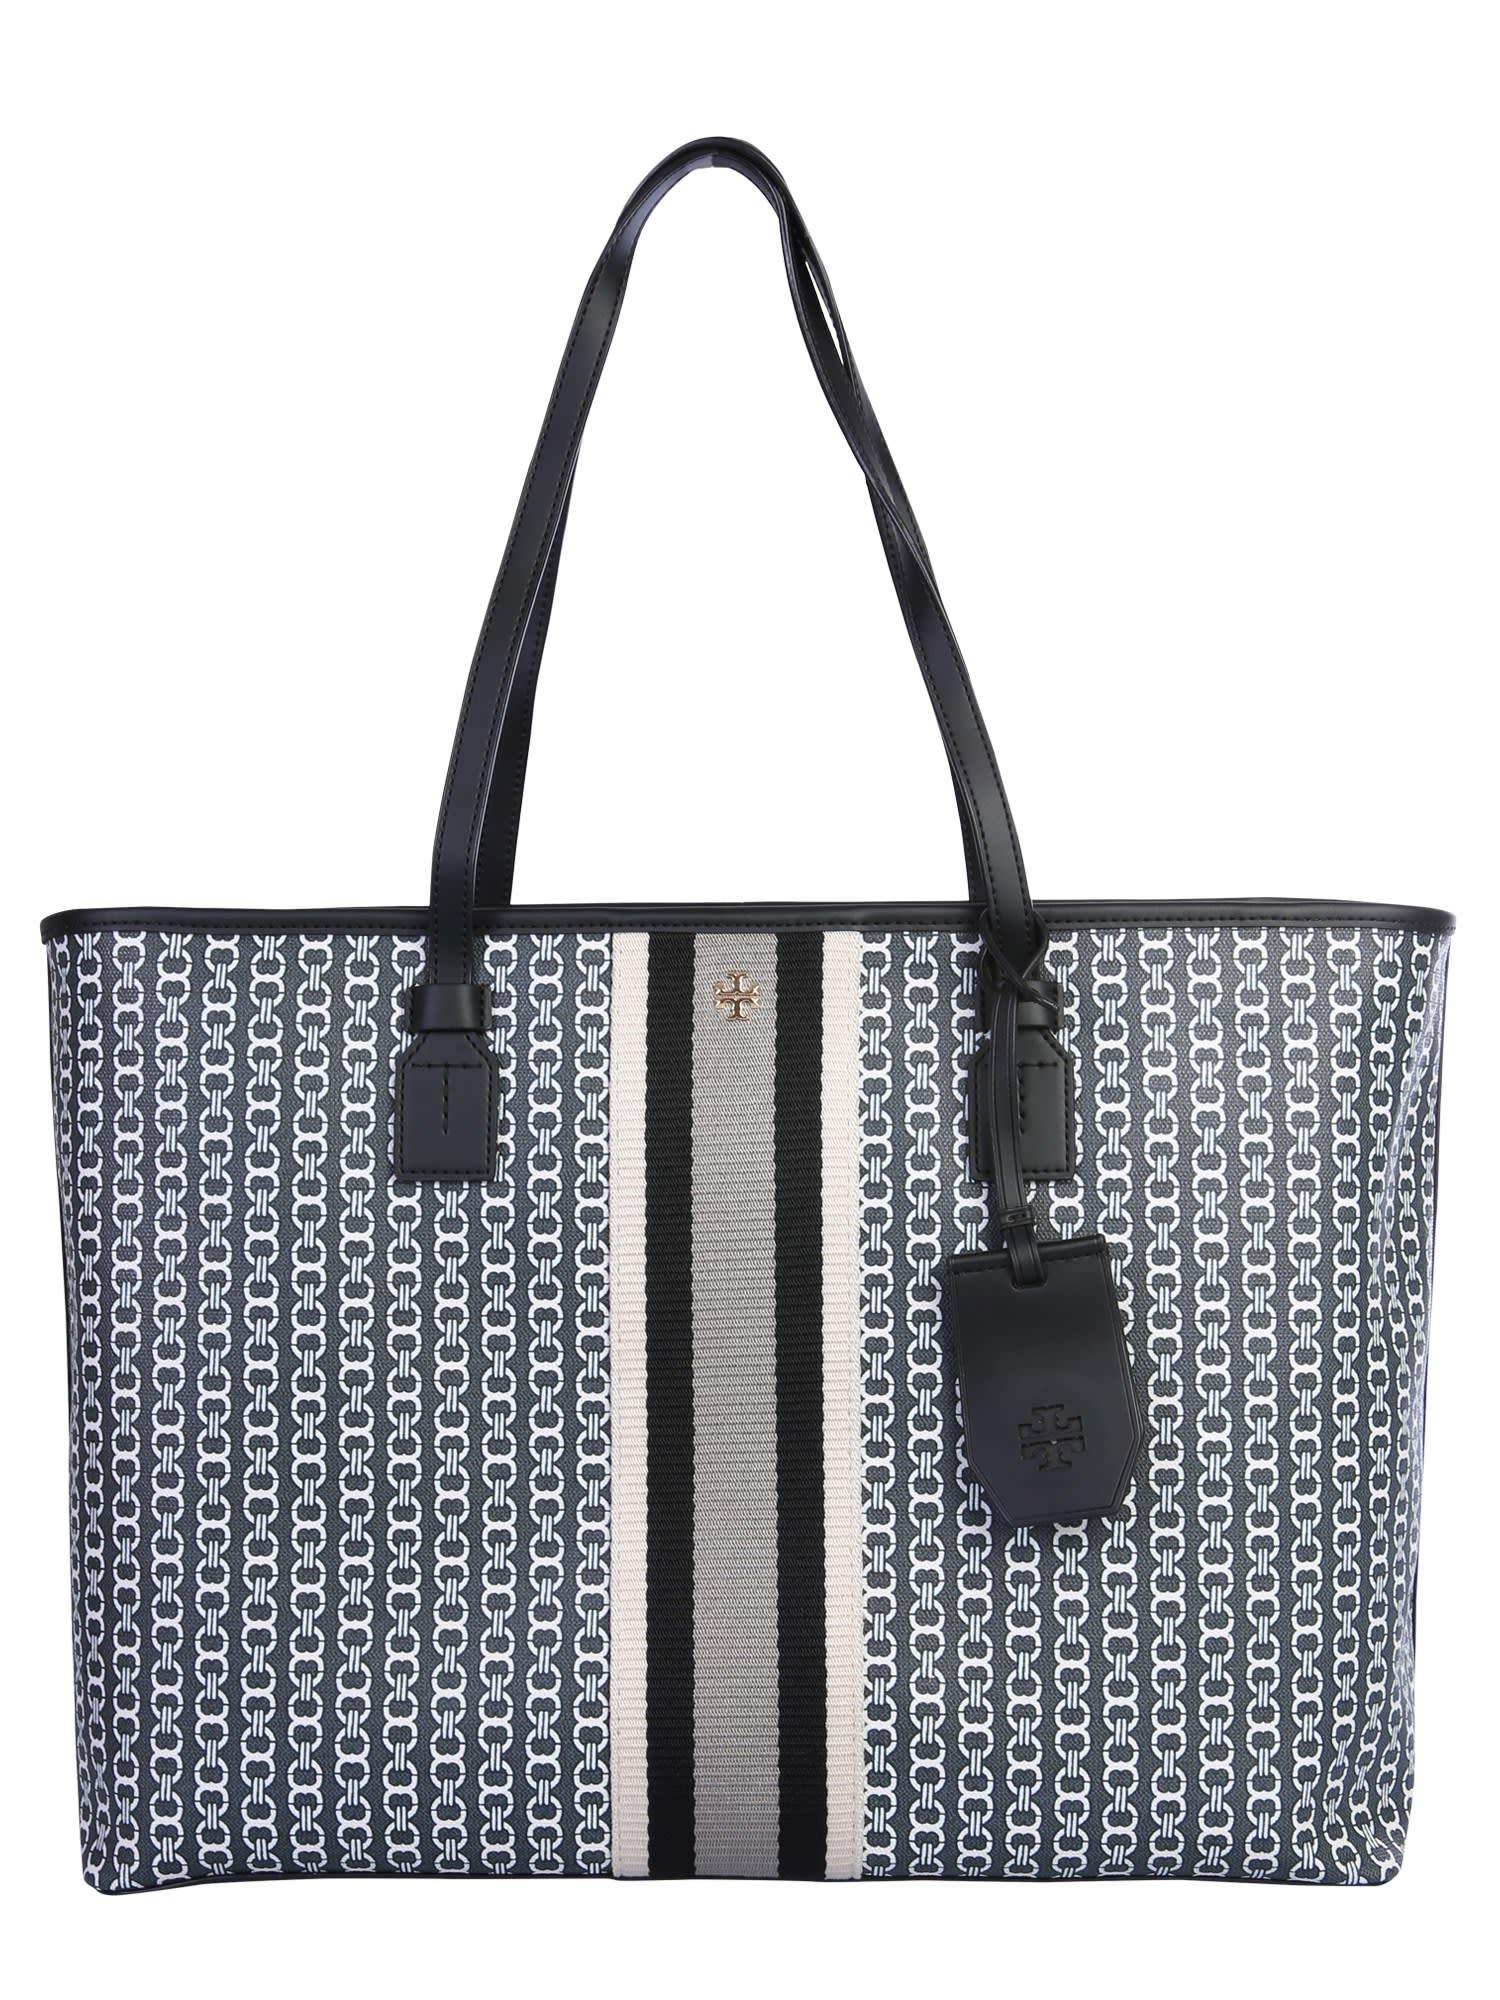 Tory Burch Gemini Bag